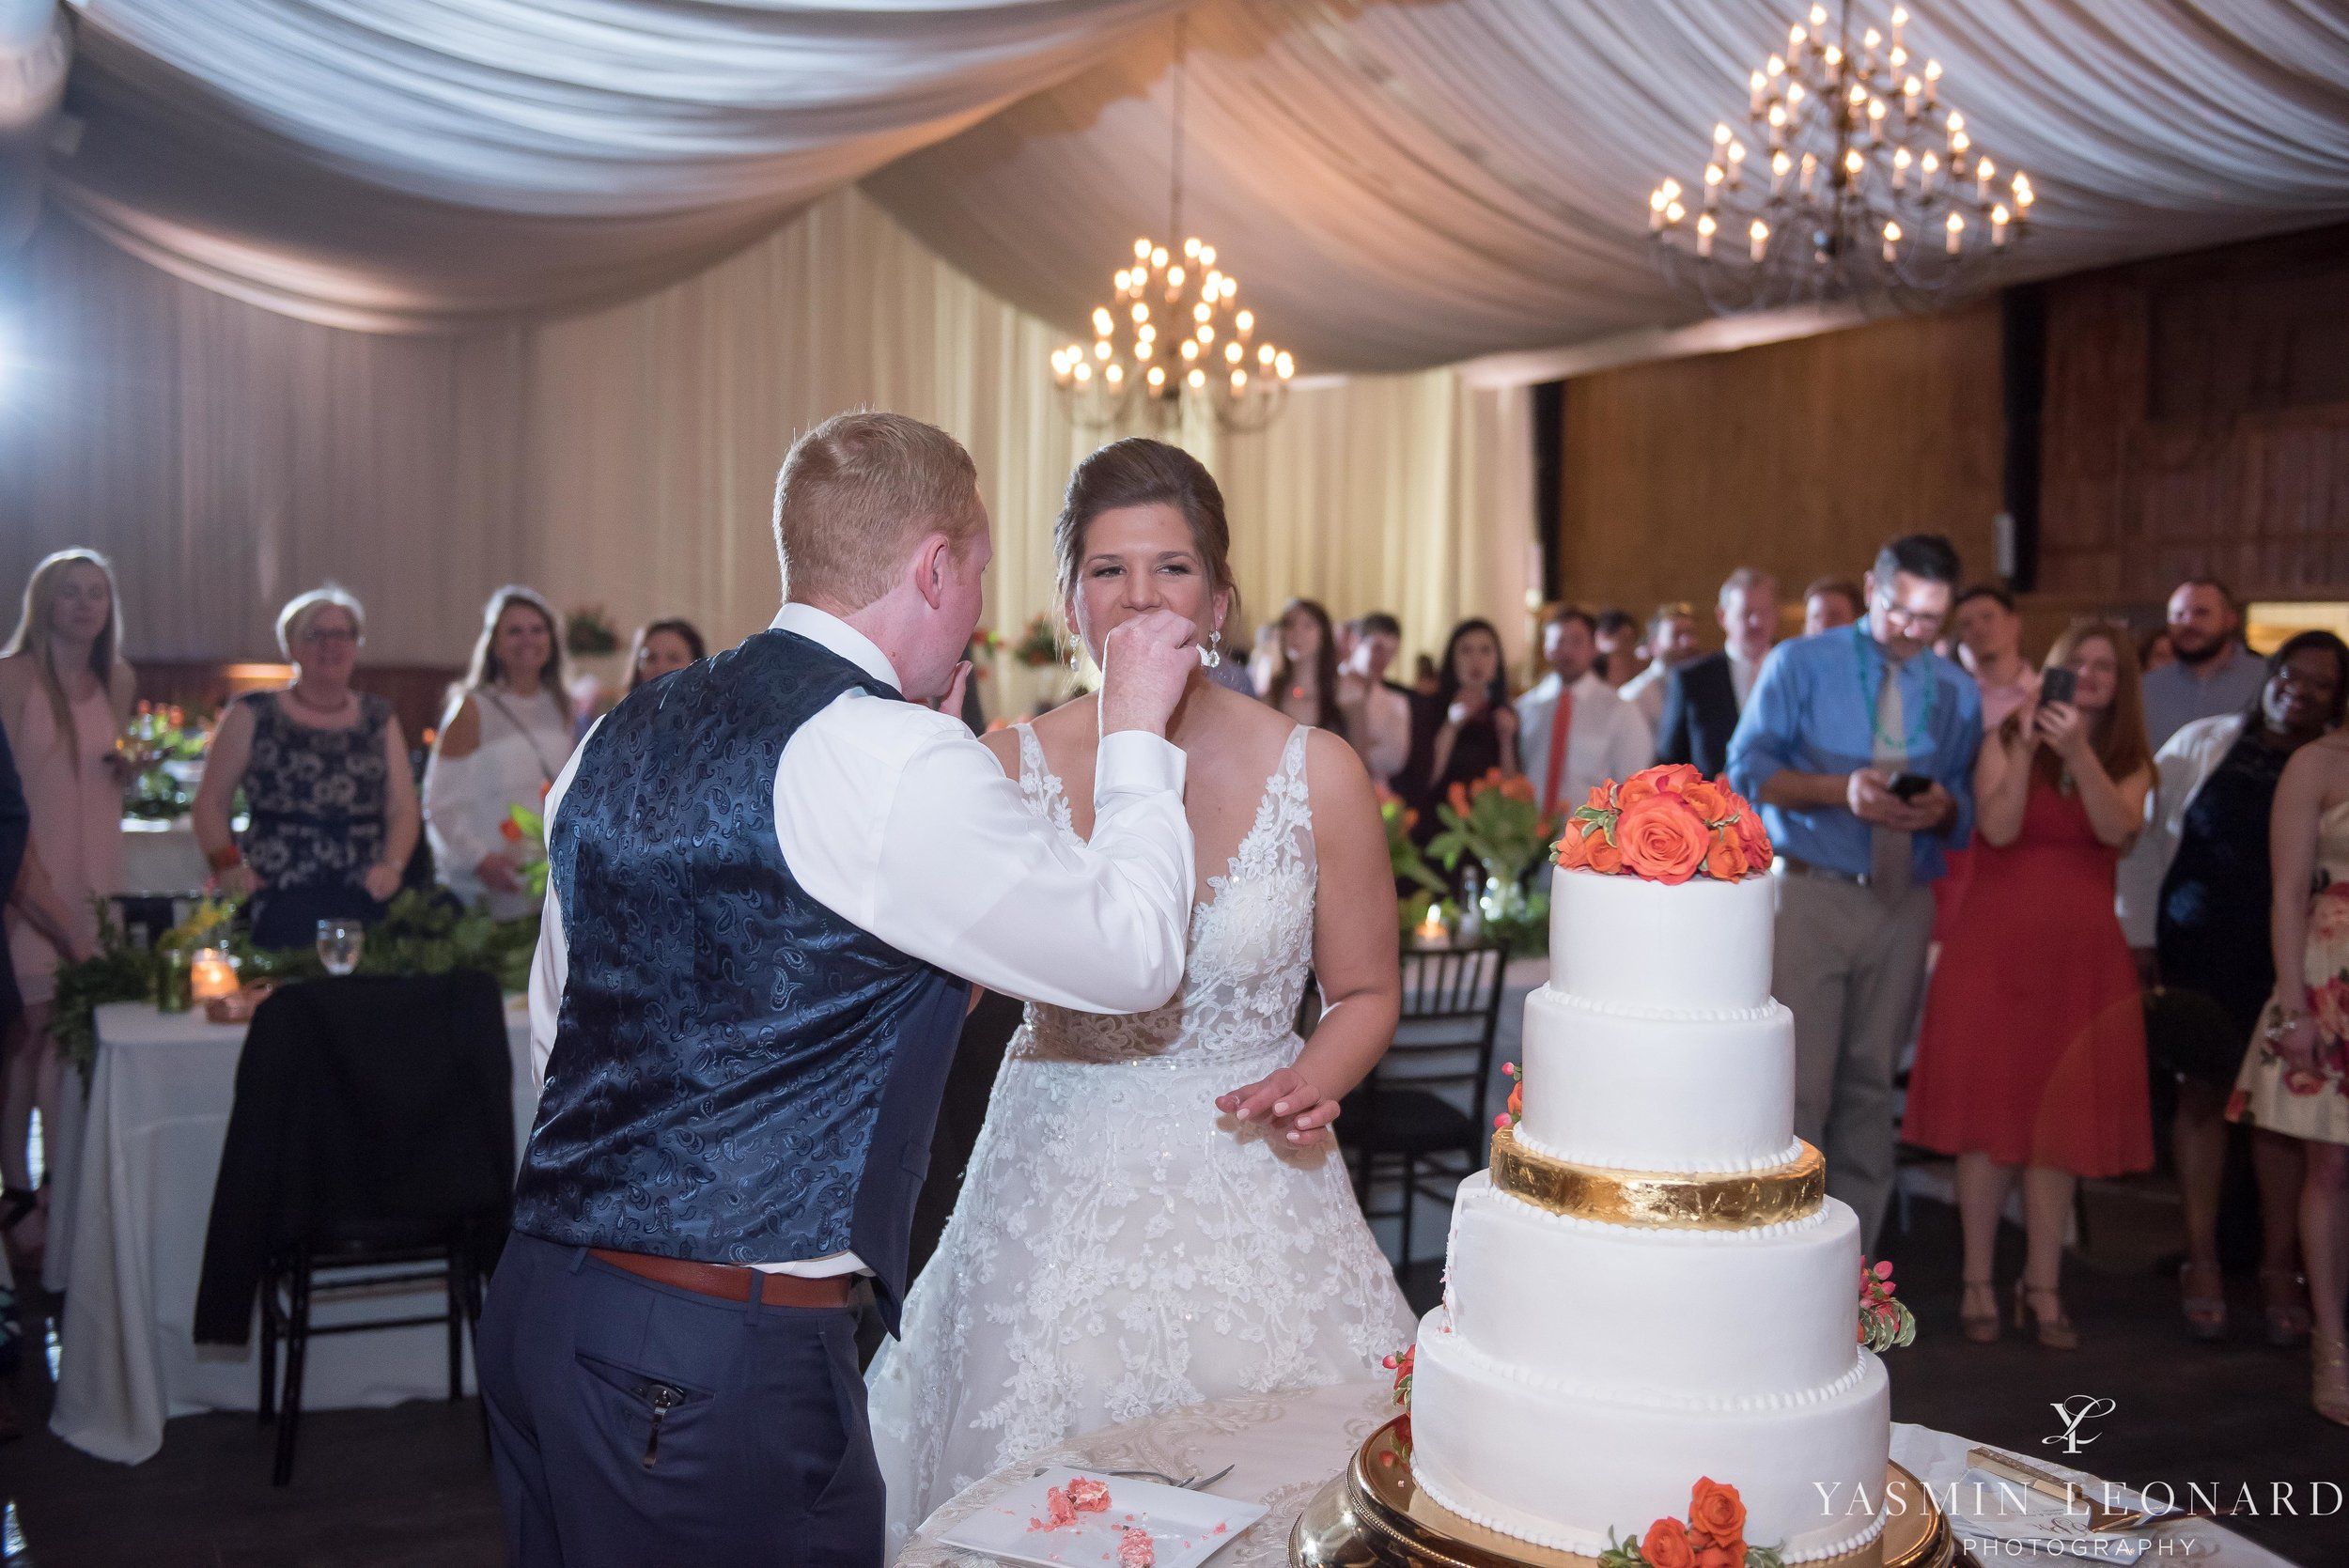 Adaumont Farm - Adaumont Farm Weddings - Trinity Weddings - NC Weddings - Yasmin Leonard Photography-82.jpg